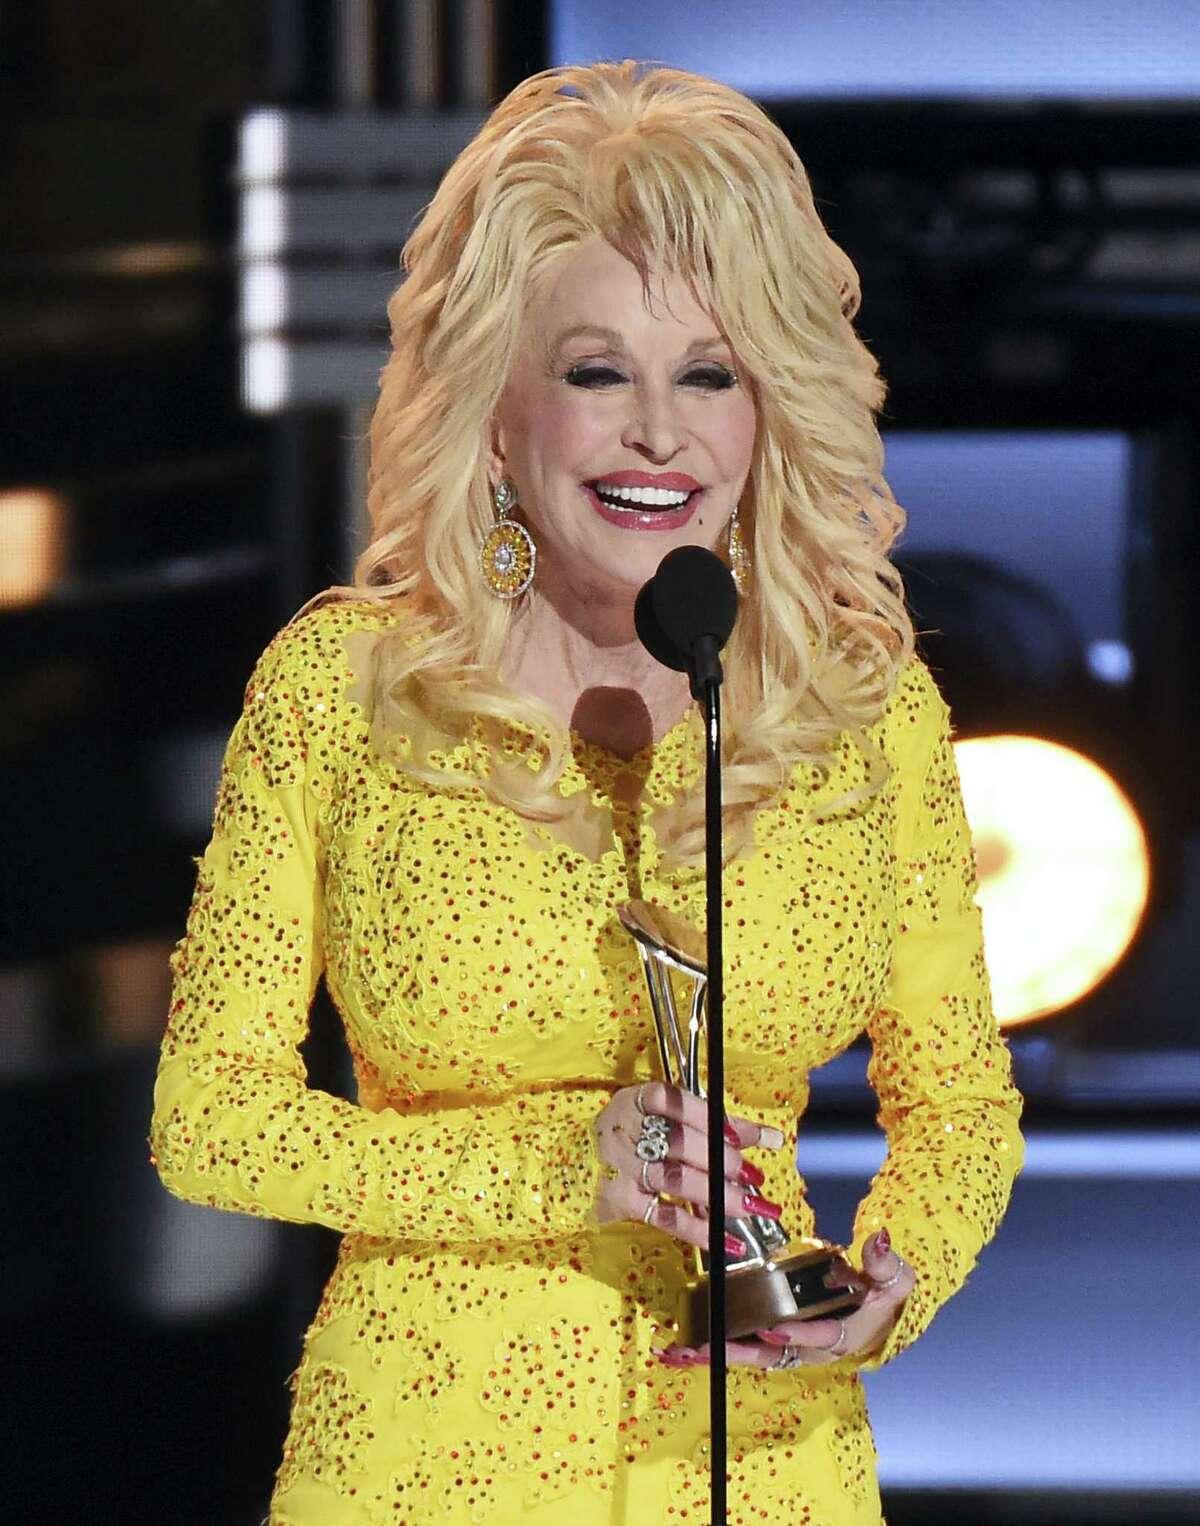 Dolly Parton accepts the Willie Nelson Lifetime Achievement Award at the 50th annual CMA Awards at the Bridgestone Arena on Nov. 2, 2016 in Nashville, Tenn.